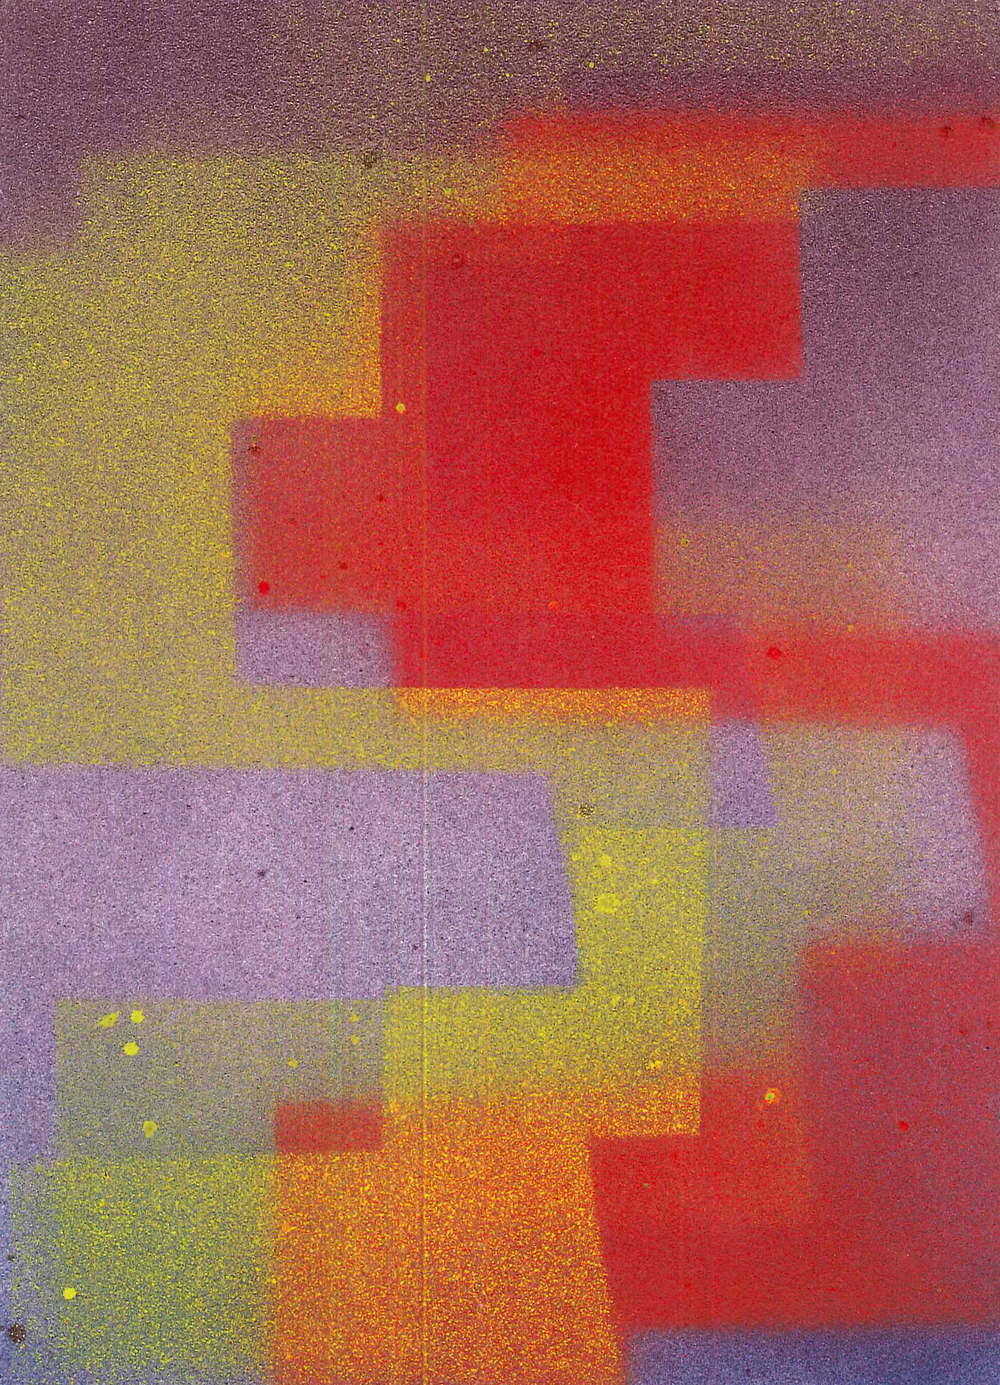 'S1', 2015, spray paint on cartridge paper, 15 x 21 cm